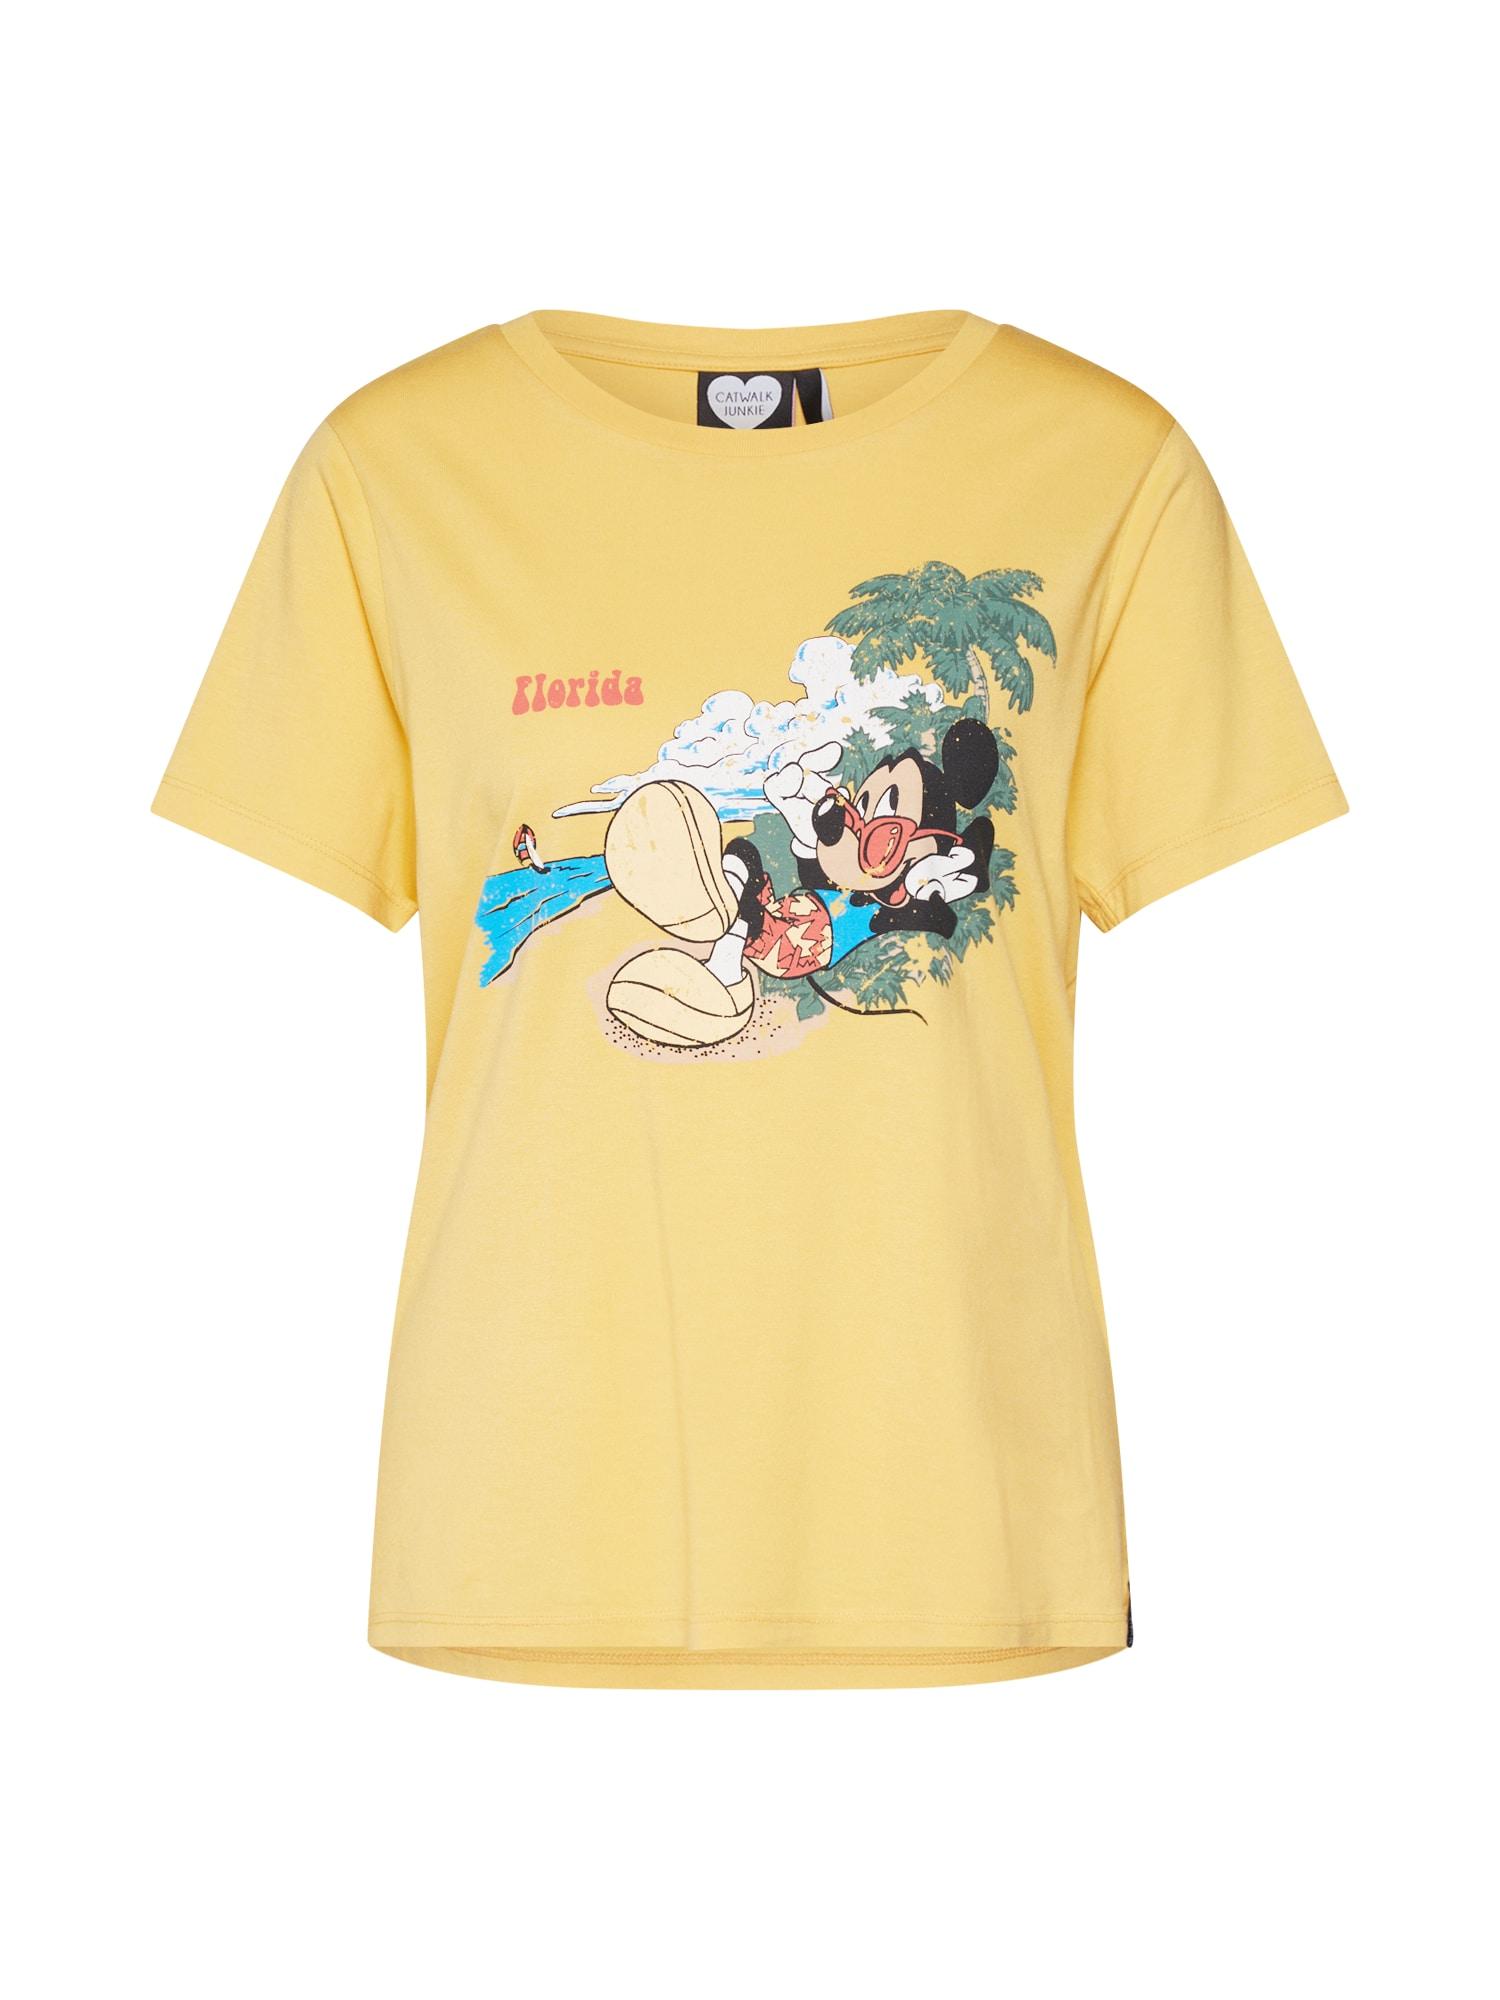 Tričko TS MICKEY FLORIDA žlutá mix barev CATWALK JUNKIE